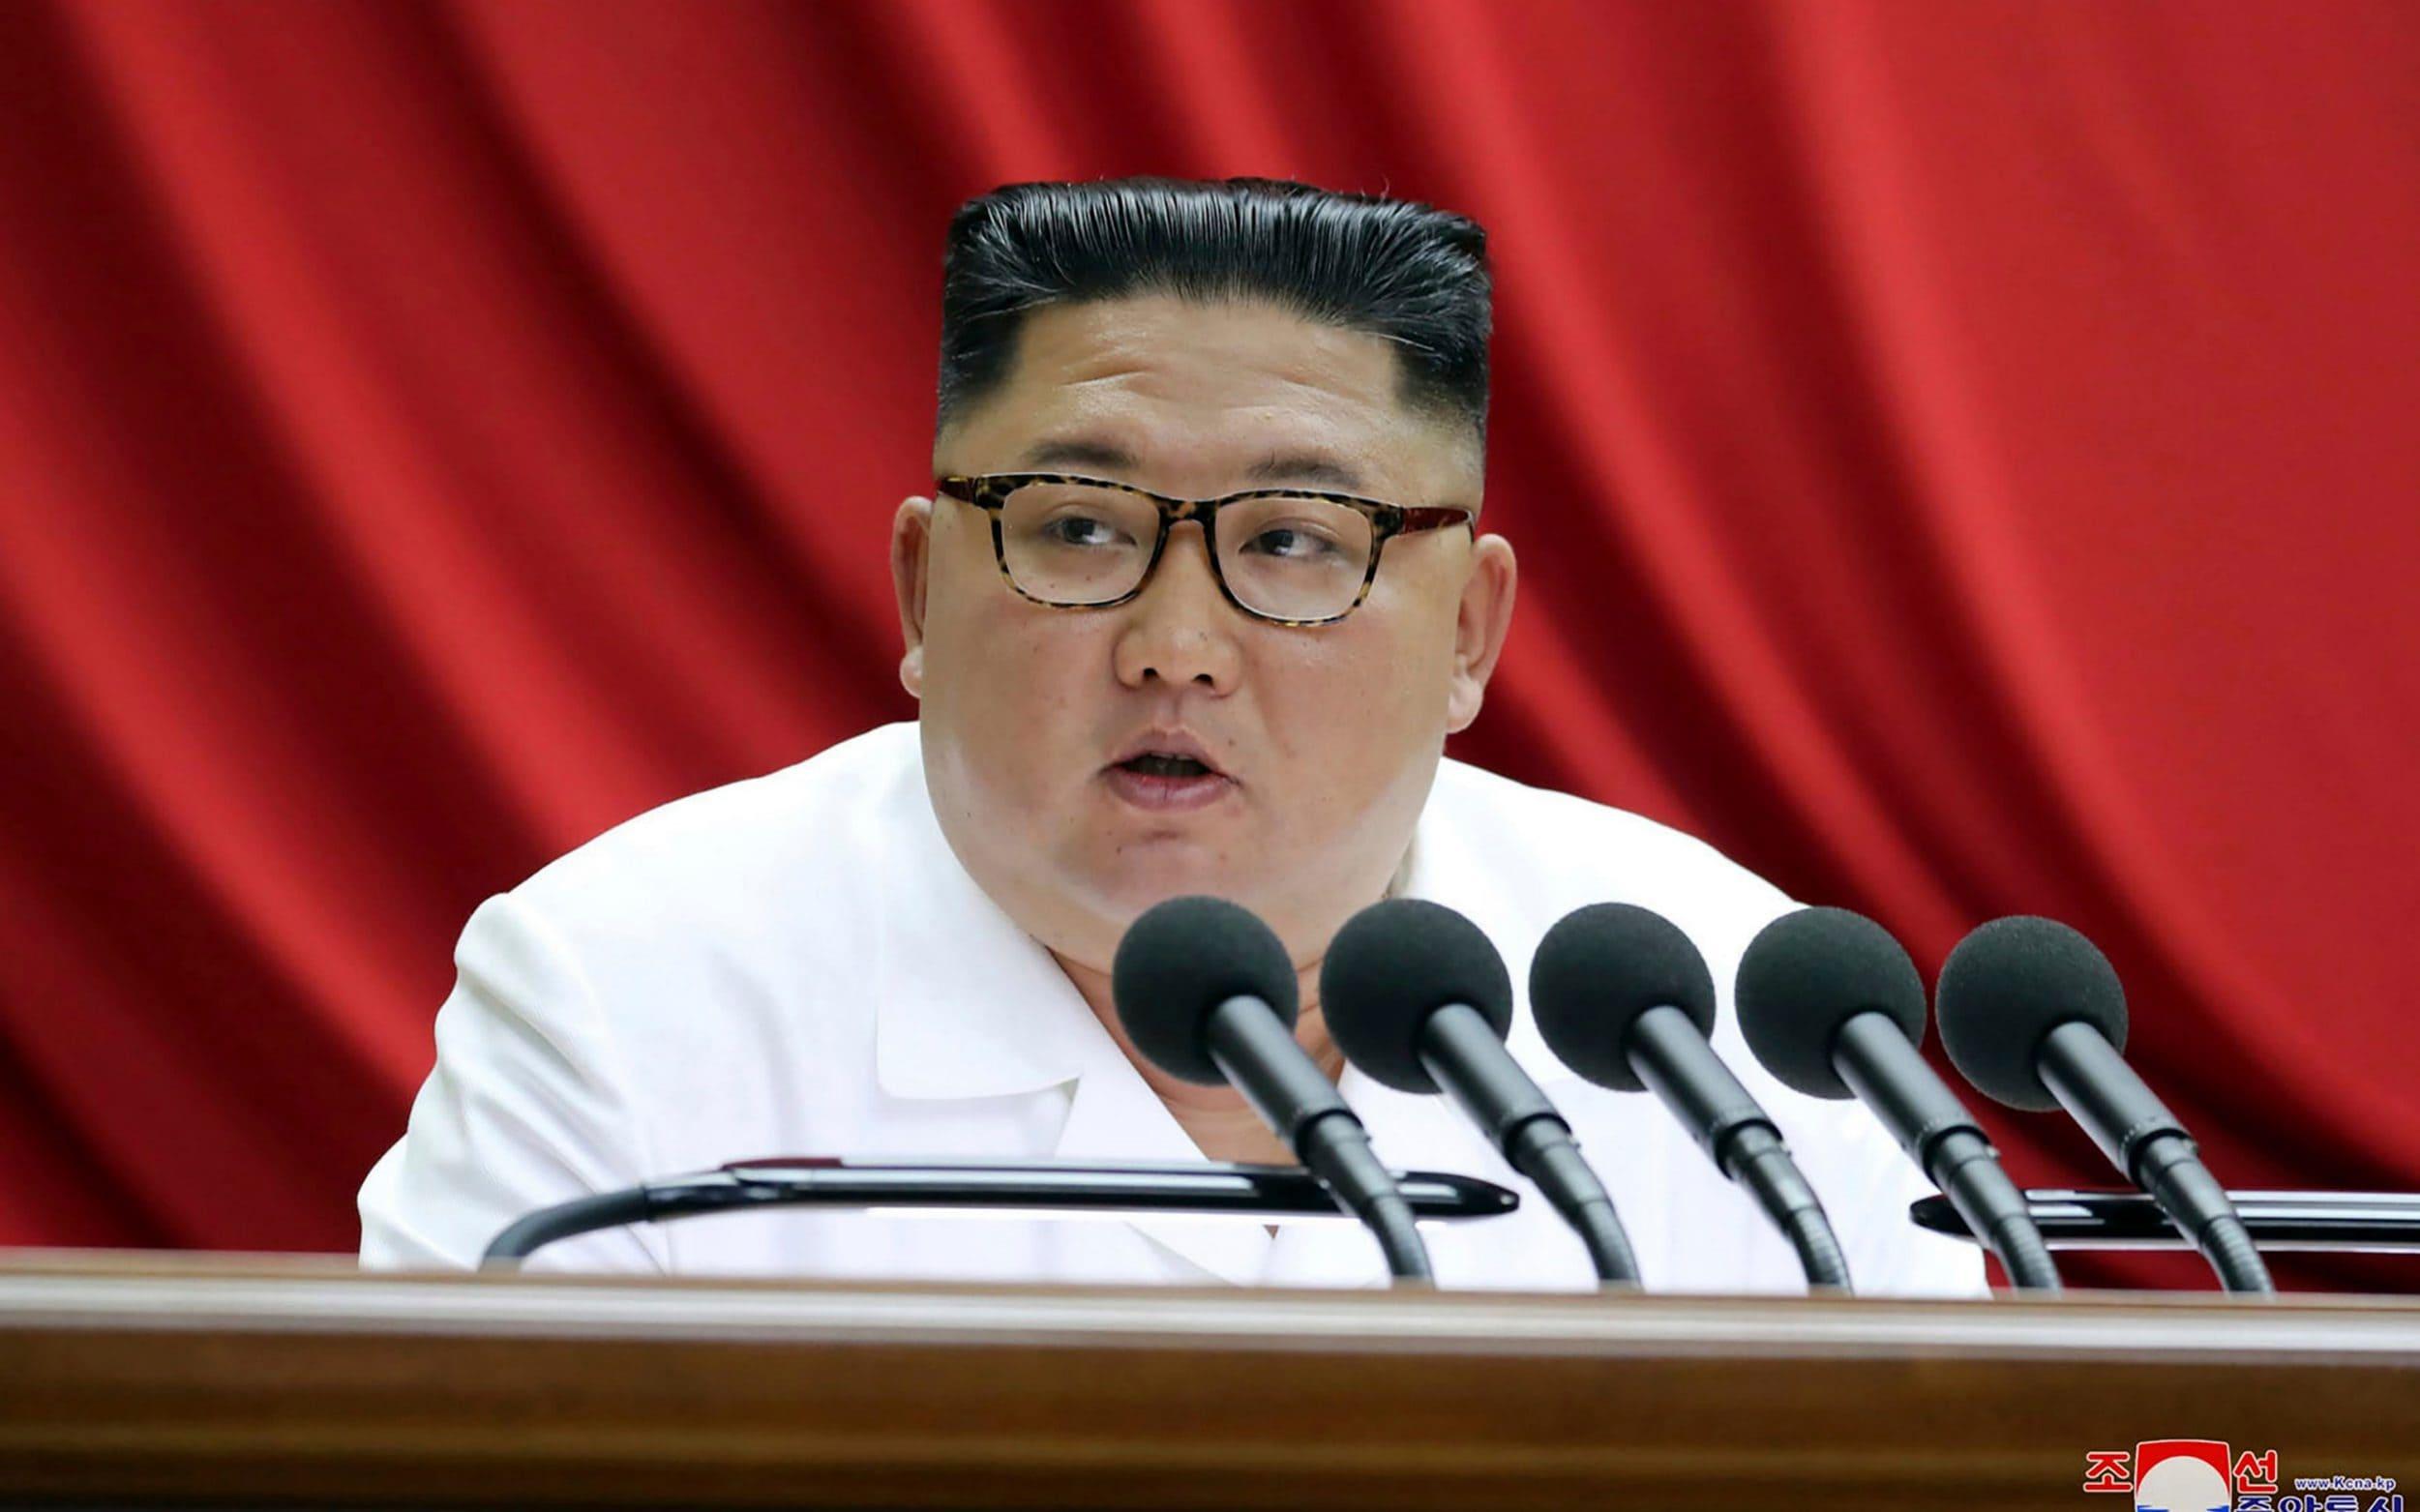 Kim Jong-un says North Korea ending moratoriums on tests - and touts new strategic weapon